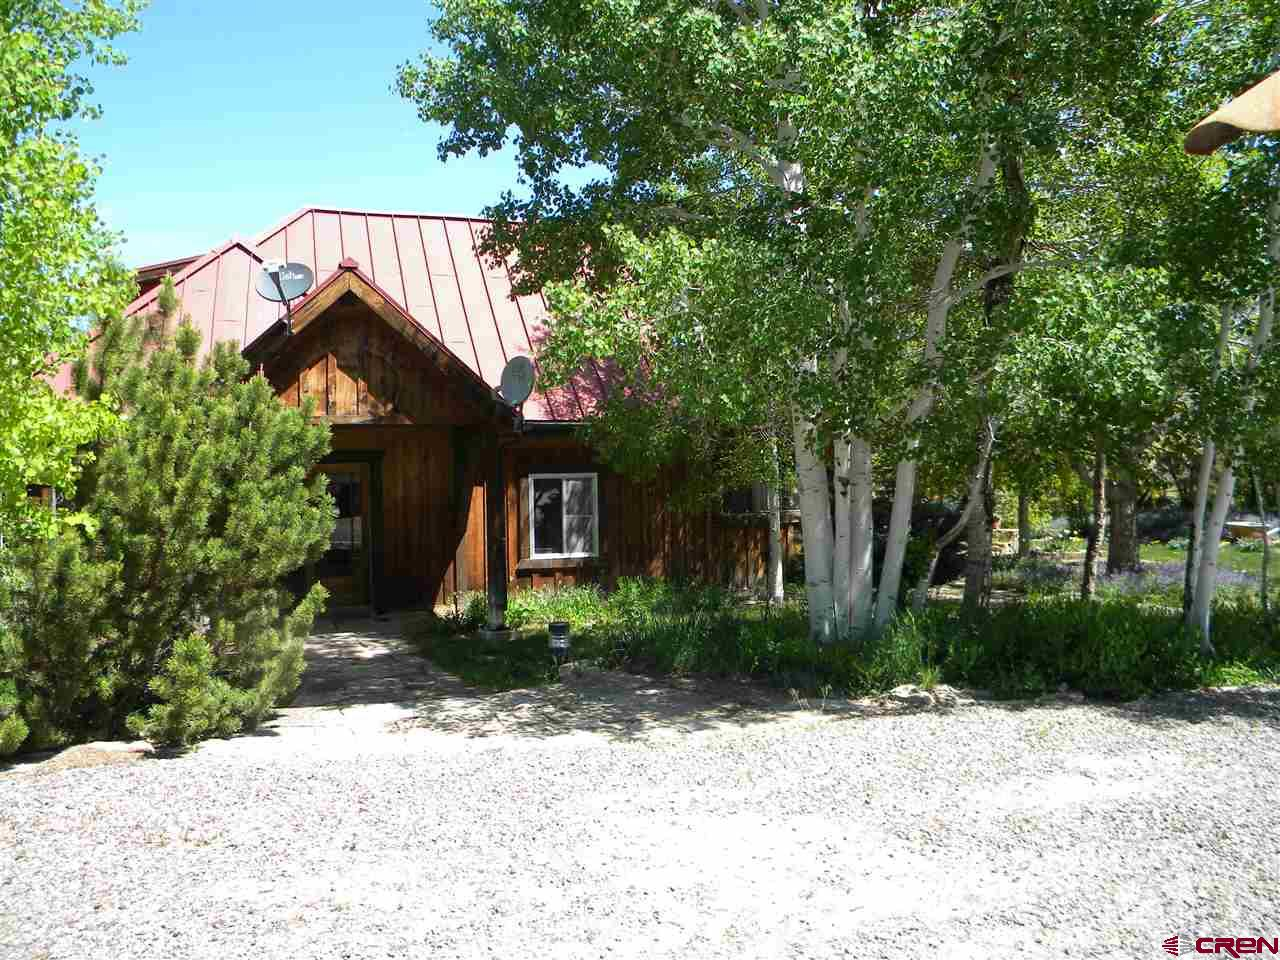 Hobby Farms for Sale Colorado on 5 acre horse farm design, farm layout design, 2 acre farm design,